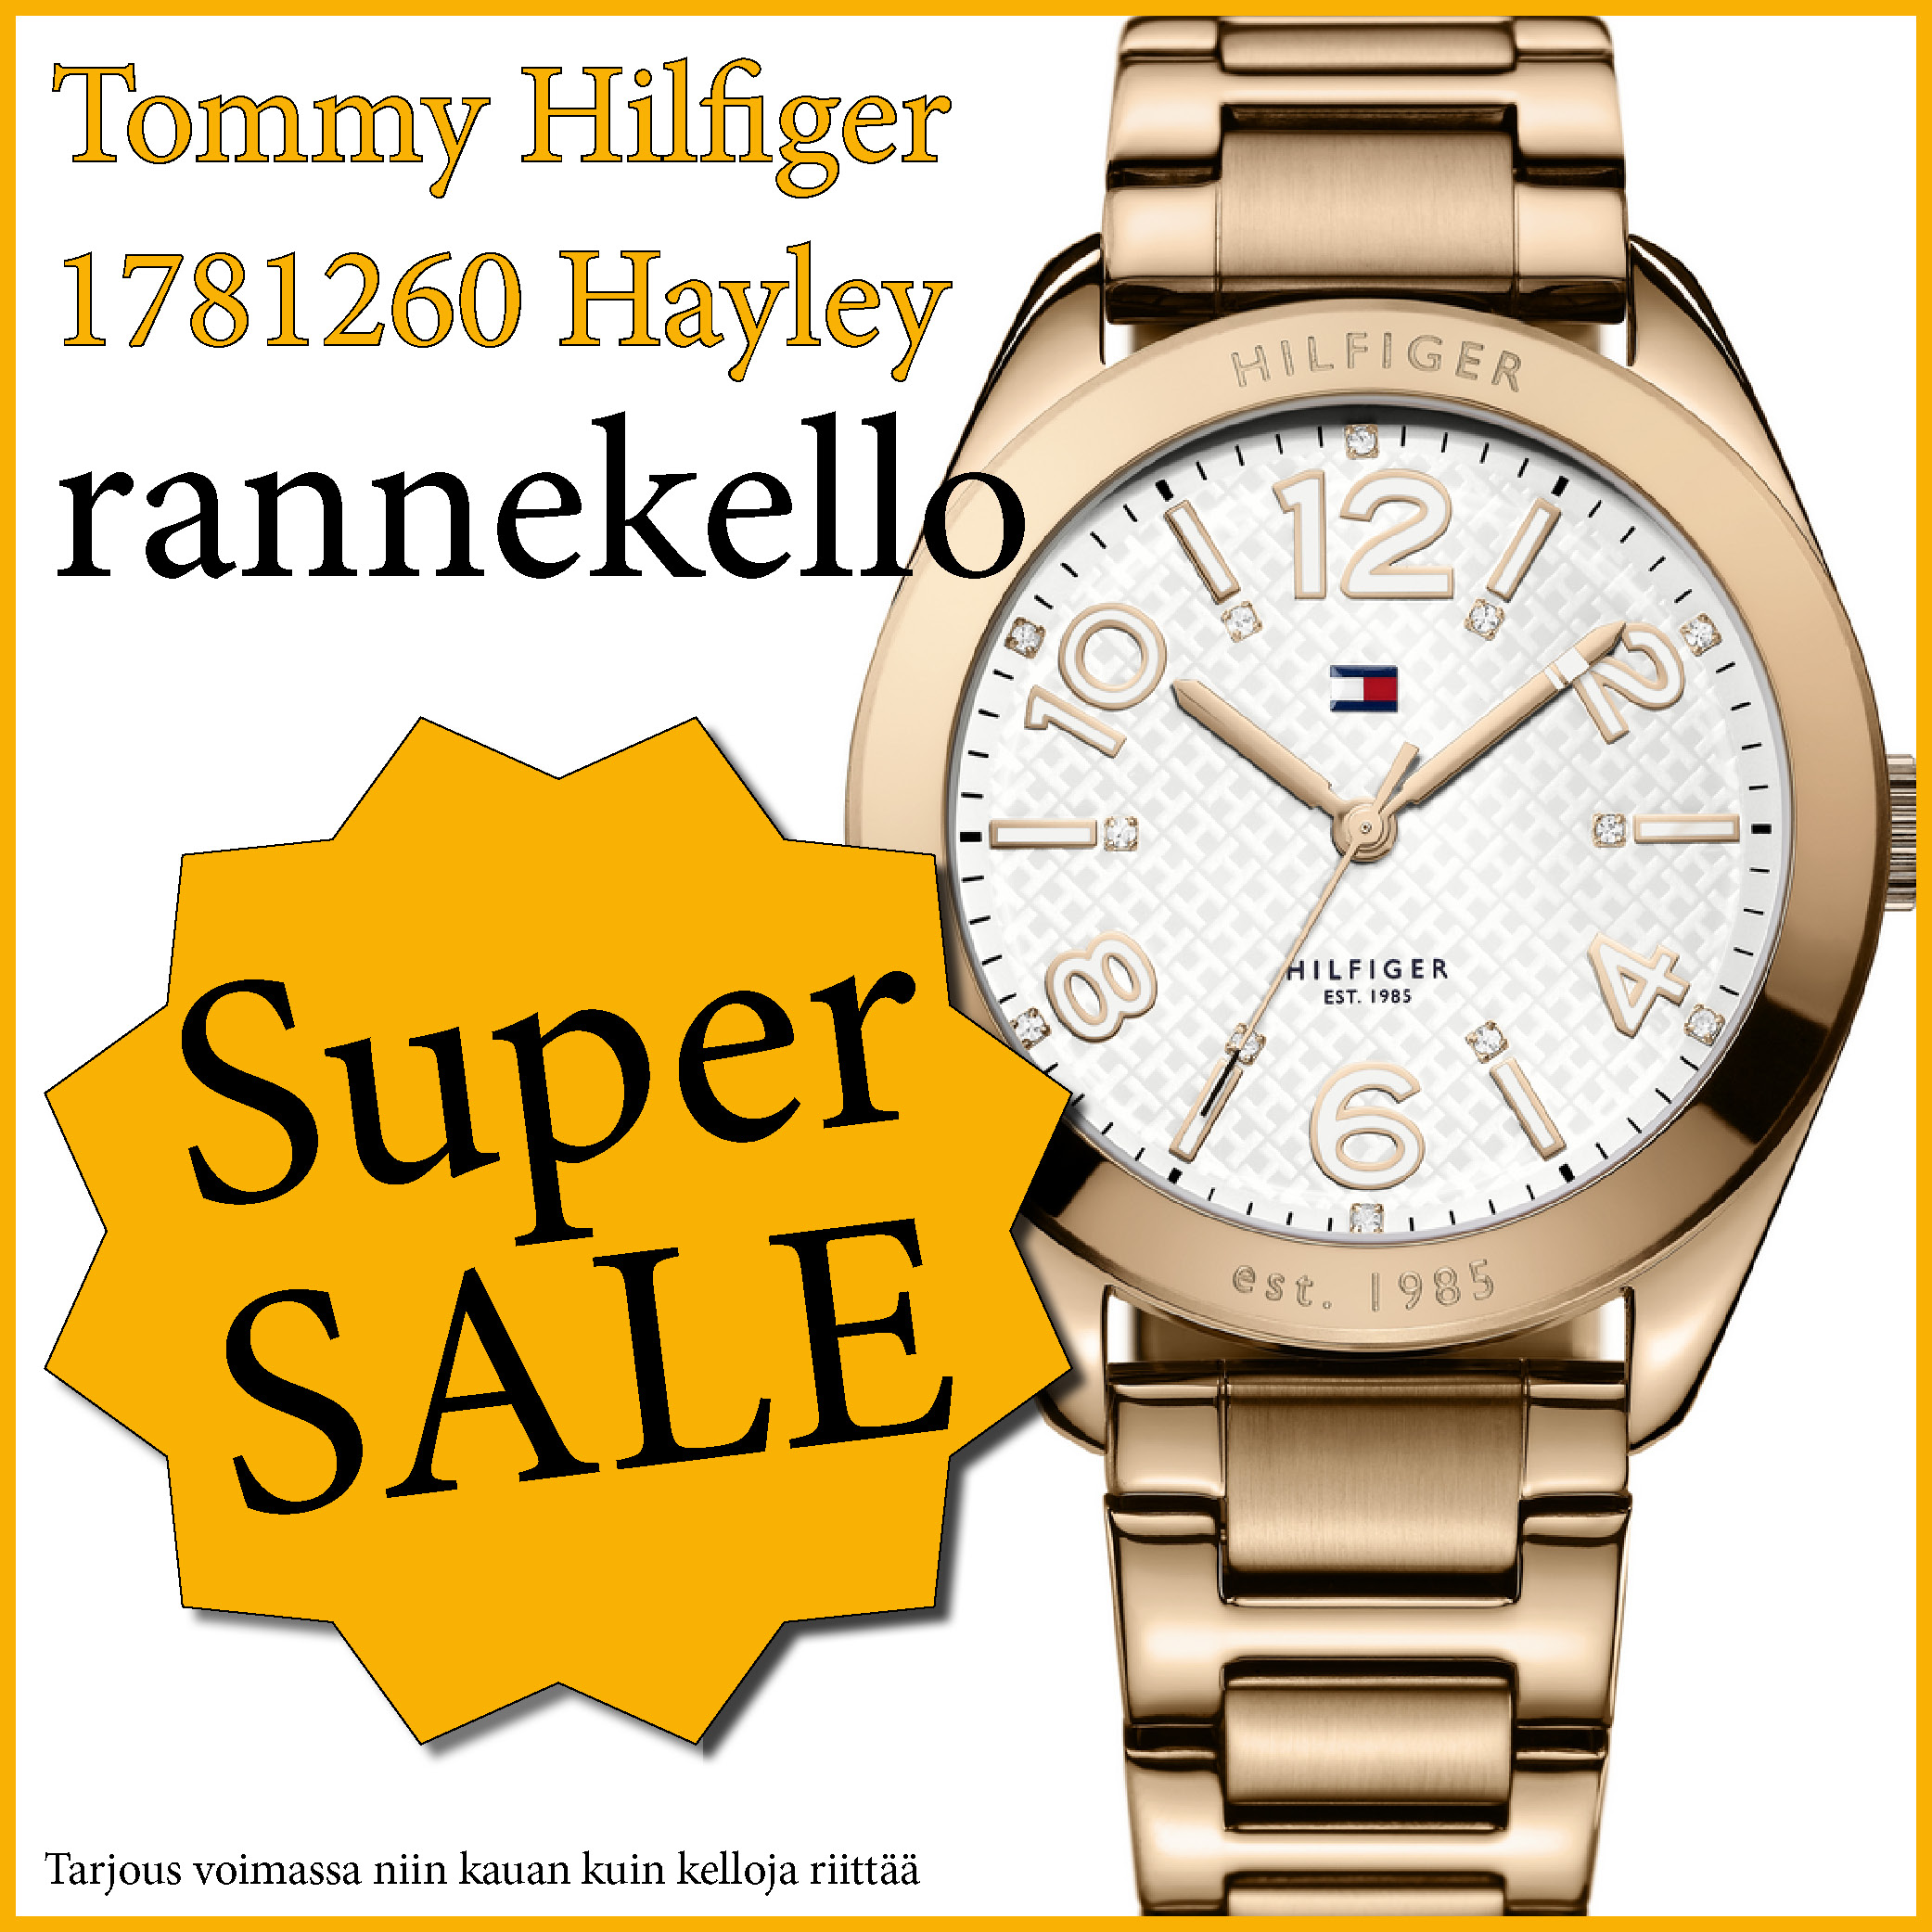 TOMMY HILFIGER 1781260 HAYLEY